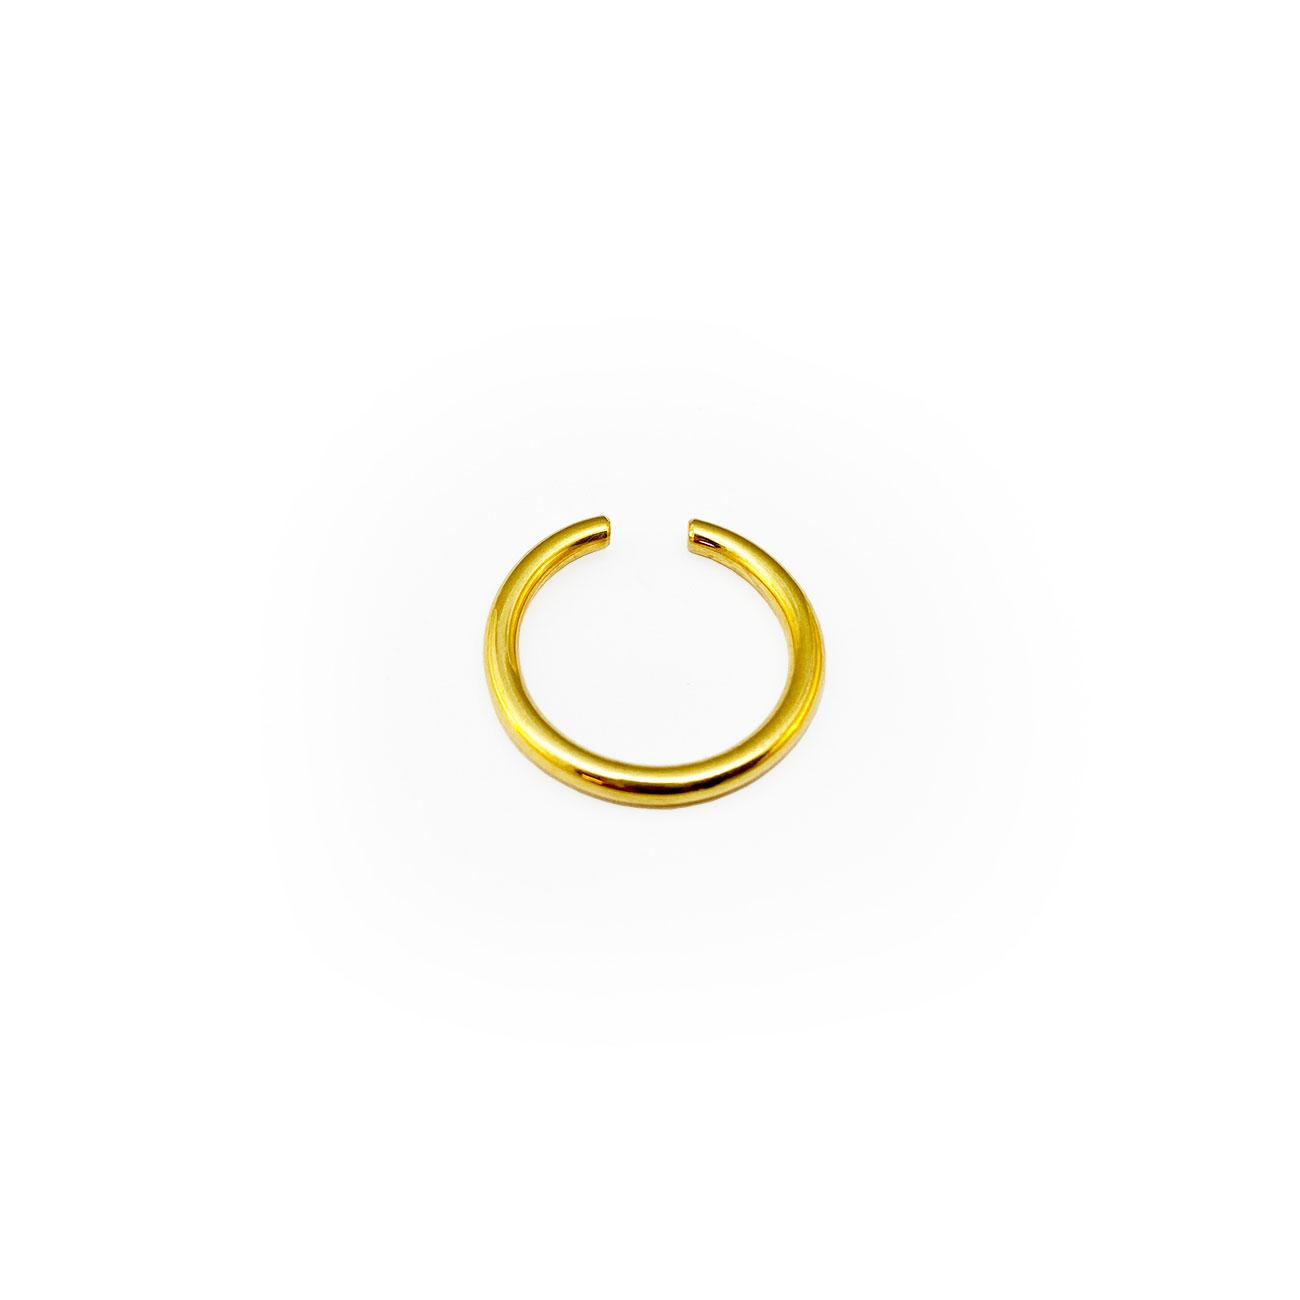 metaformi_design_jewelry_loop_big_golden_ear_cuff